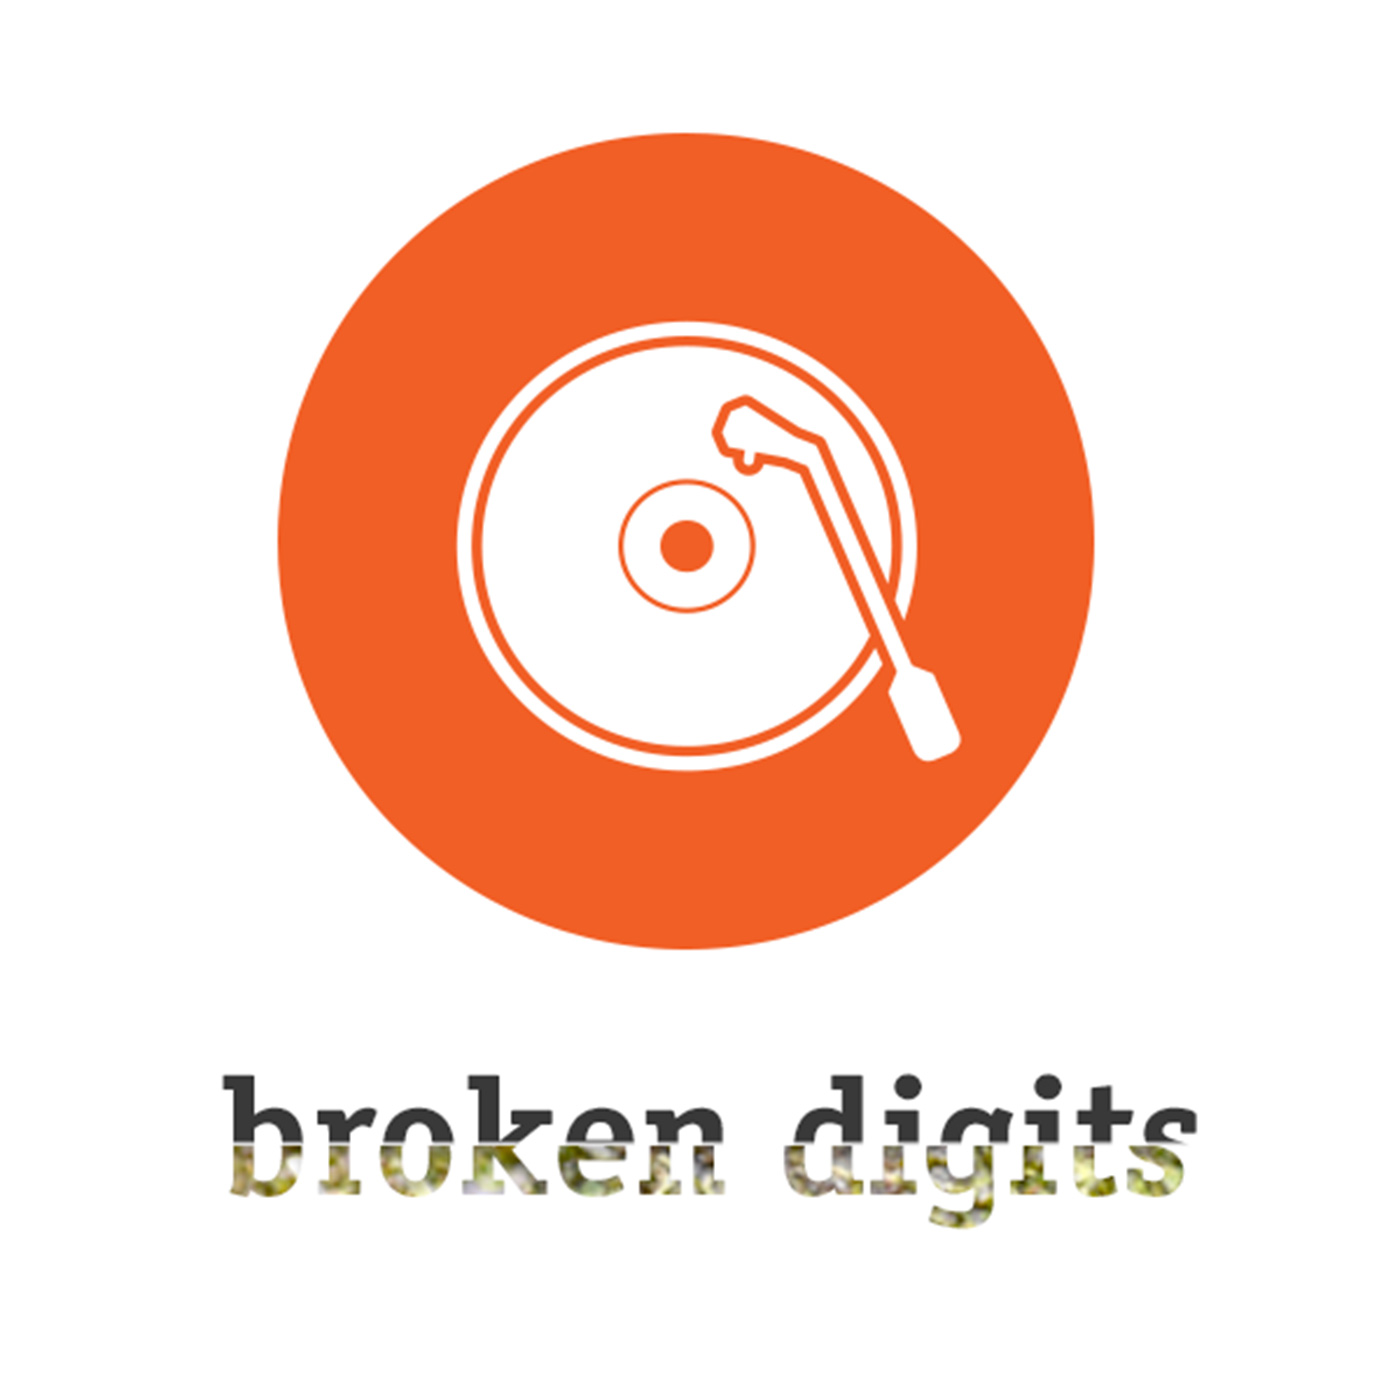 Music – broken digits